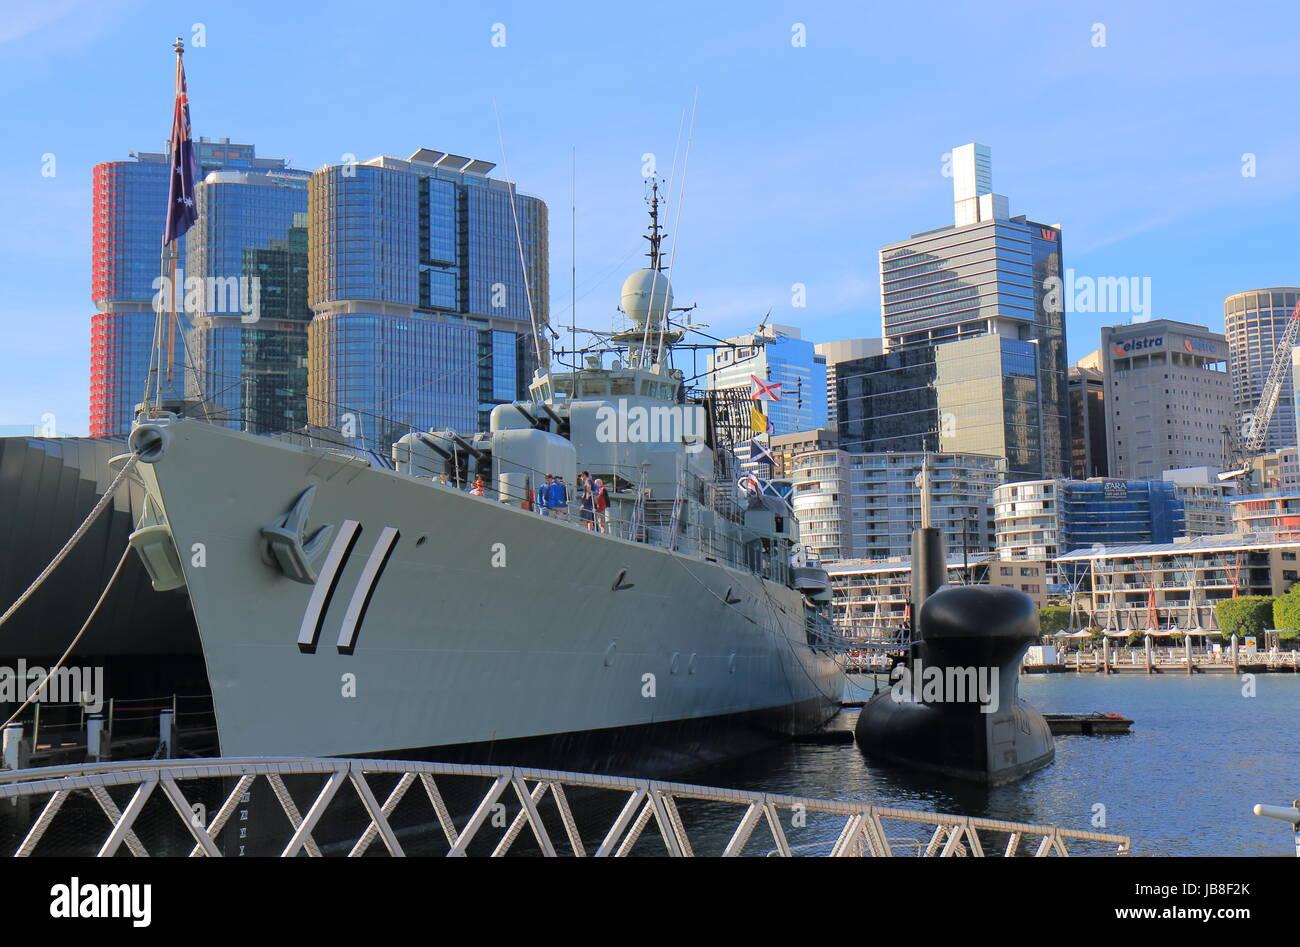 HMAS Vampire in Darling Harbour Sydney Australia. HMAS Vampire  is one of the first all welded ships built in Australia. - Stock Image